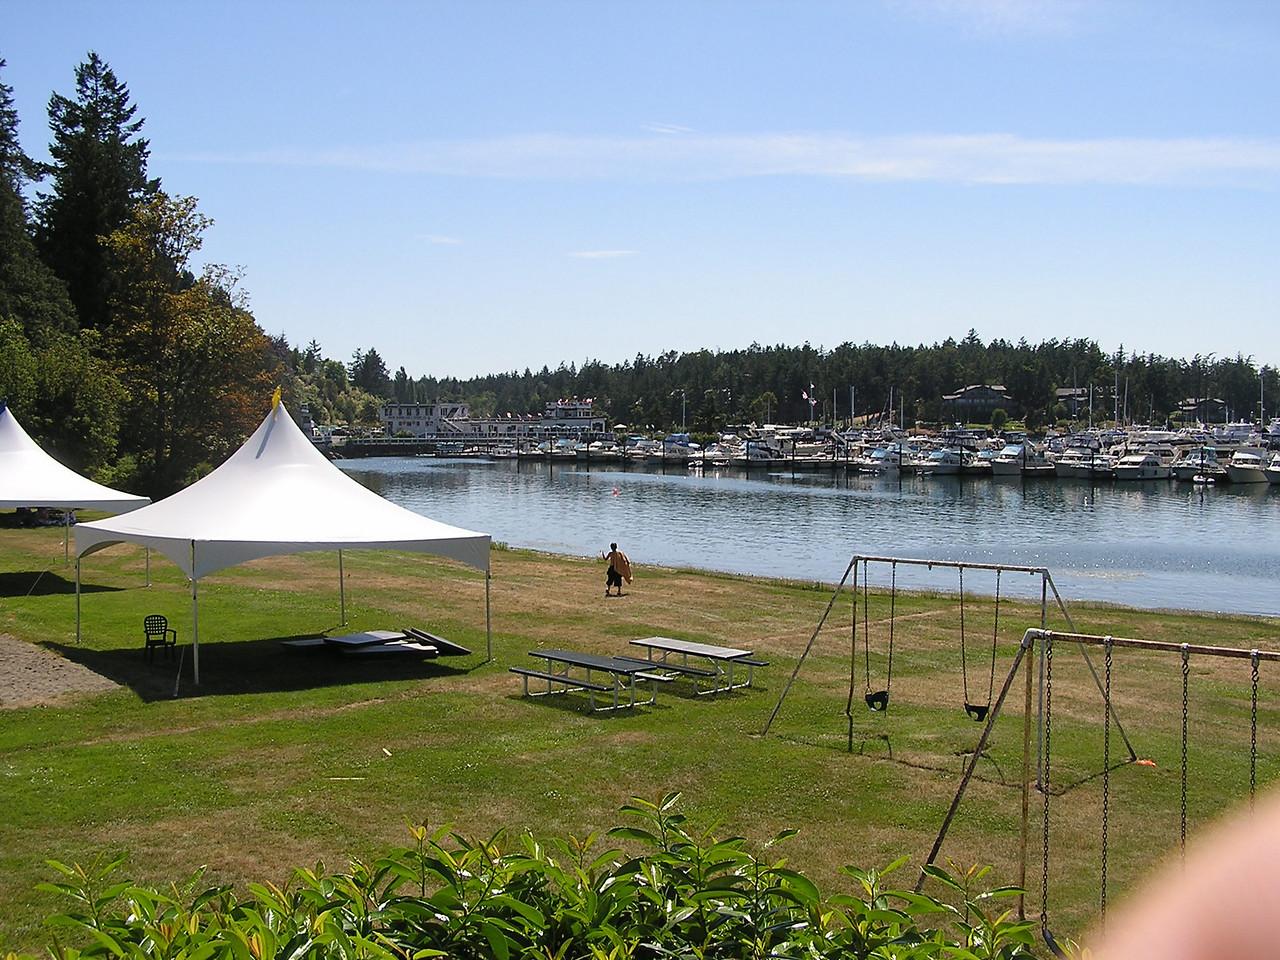 Day 5: Roche Harbor on San Juan Island, Washington State, United States